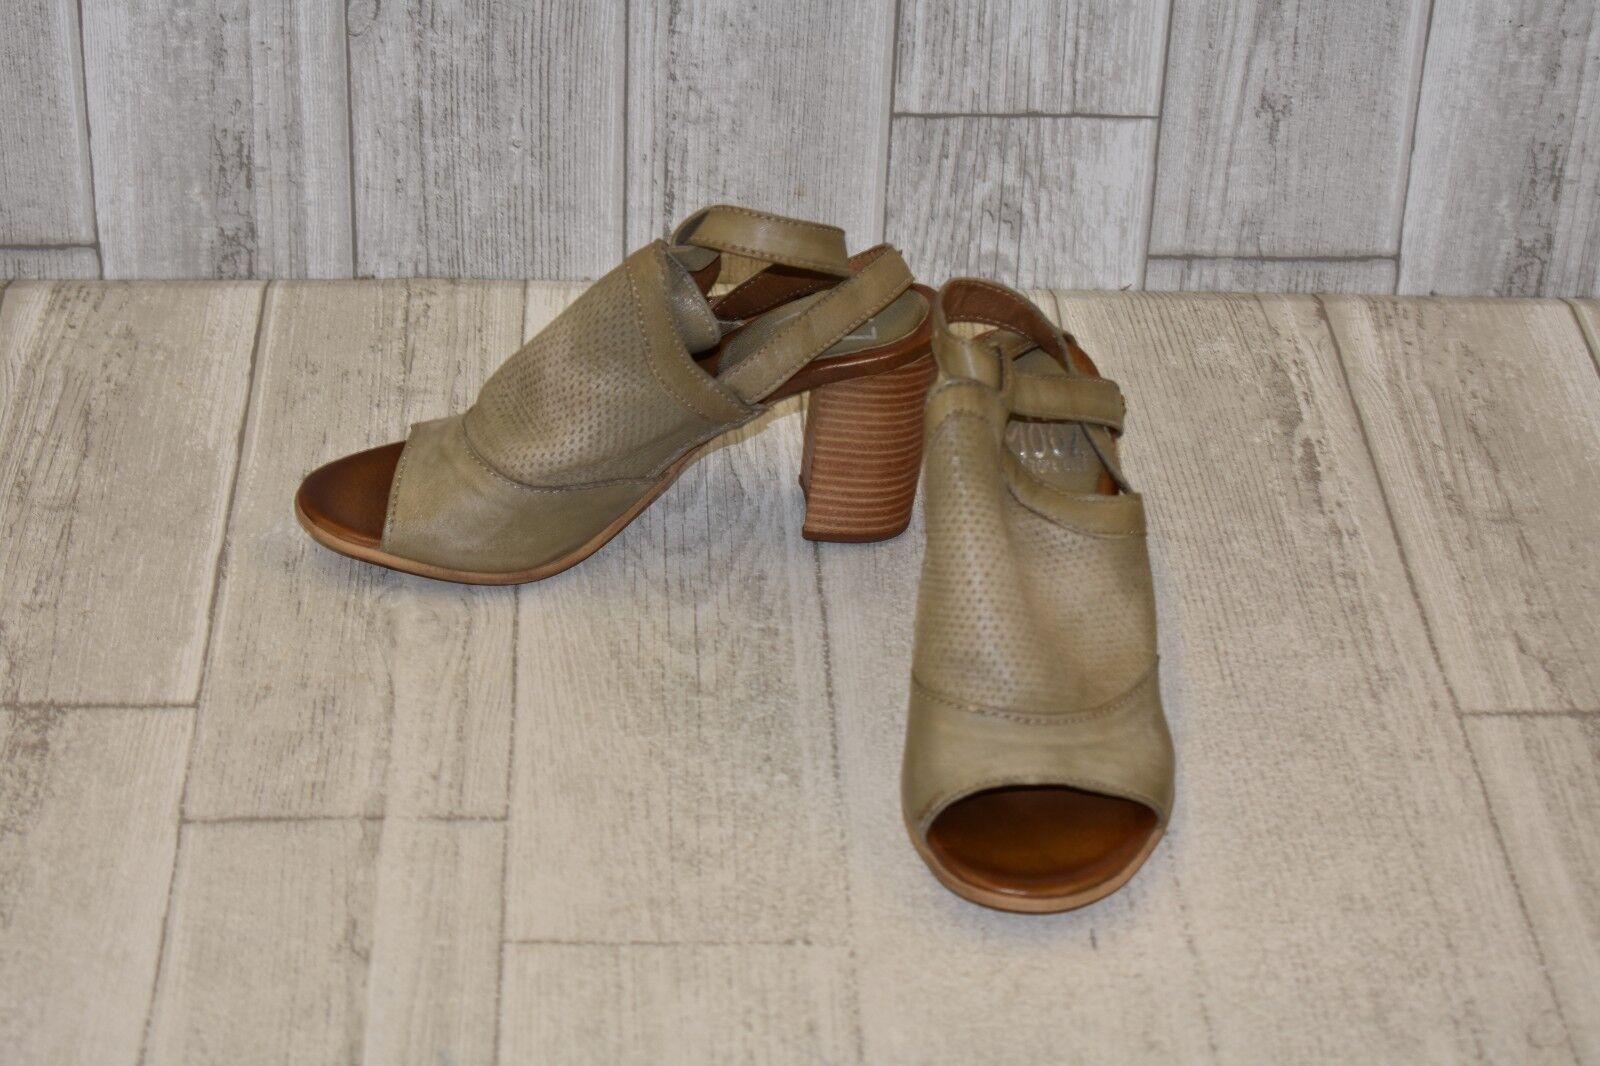 Miz Mooz Shiloh Heeled Sandal - Women's Size 7.5 8 Grey